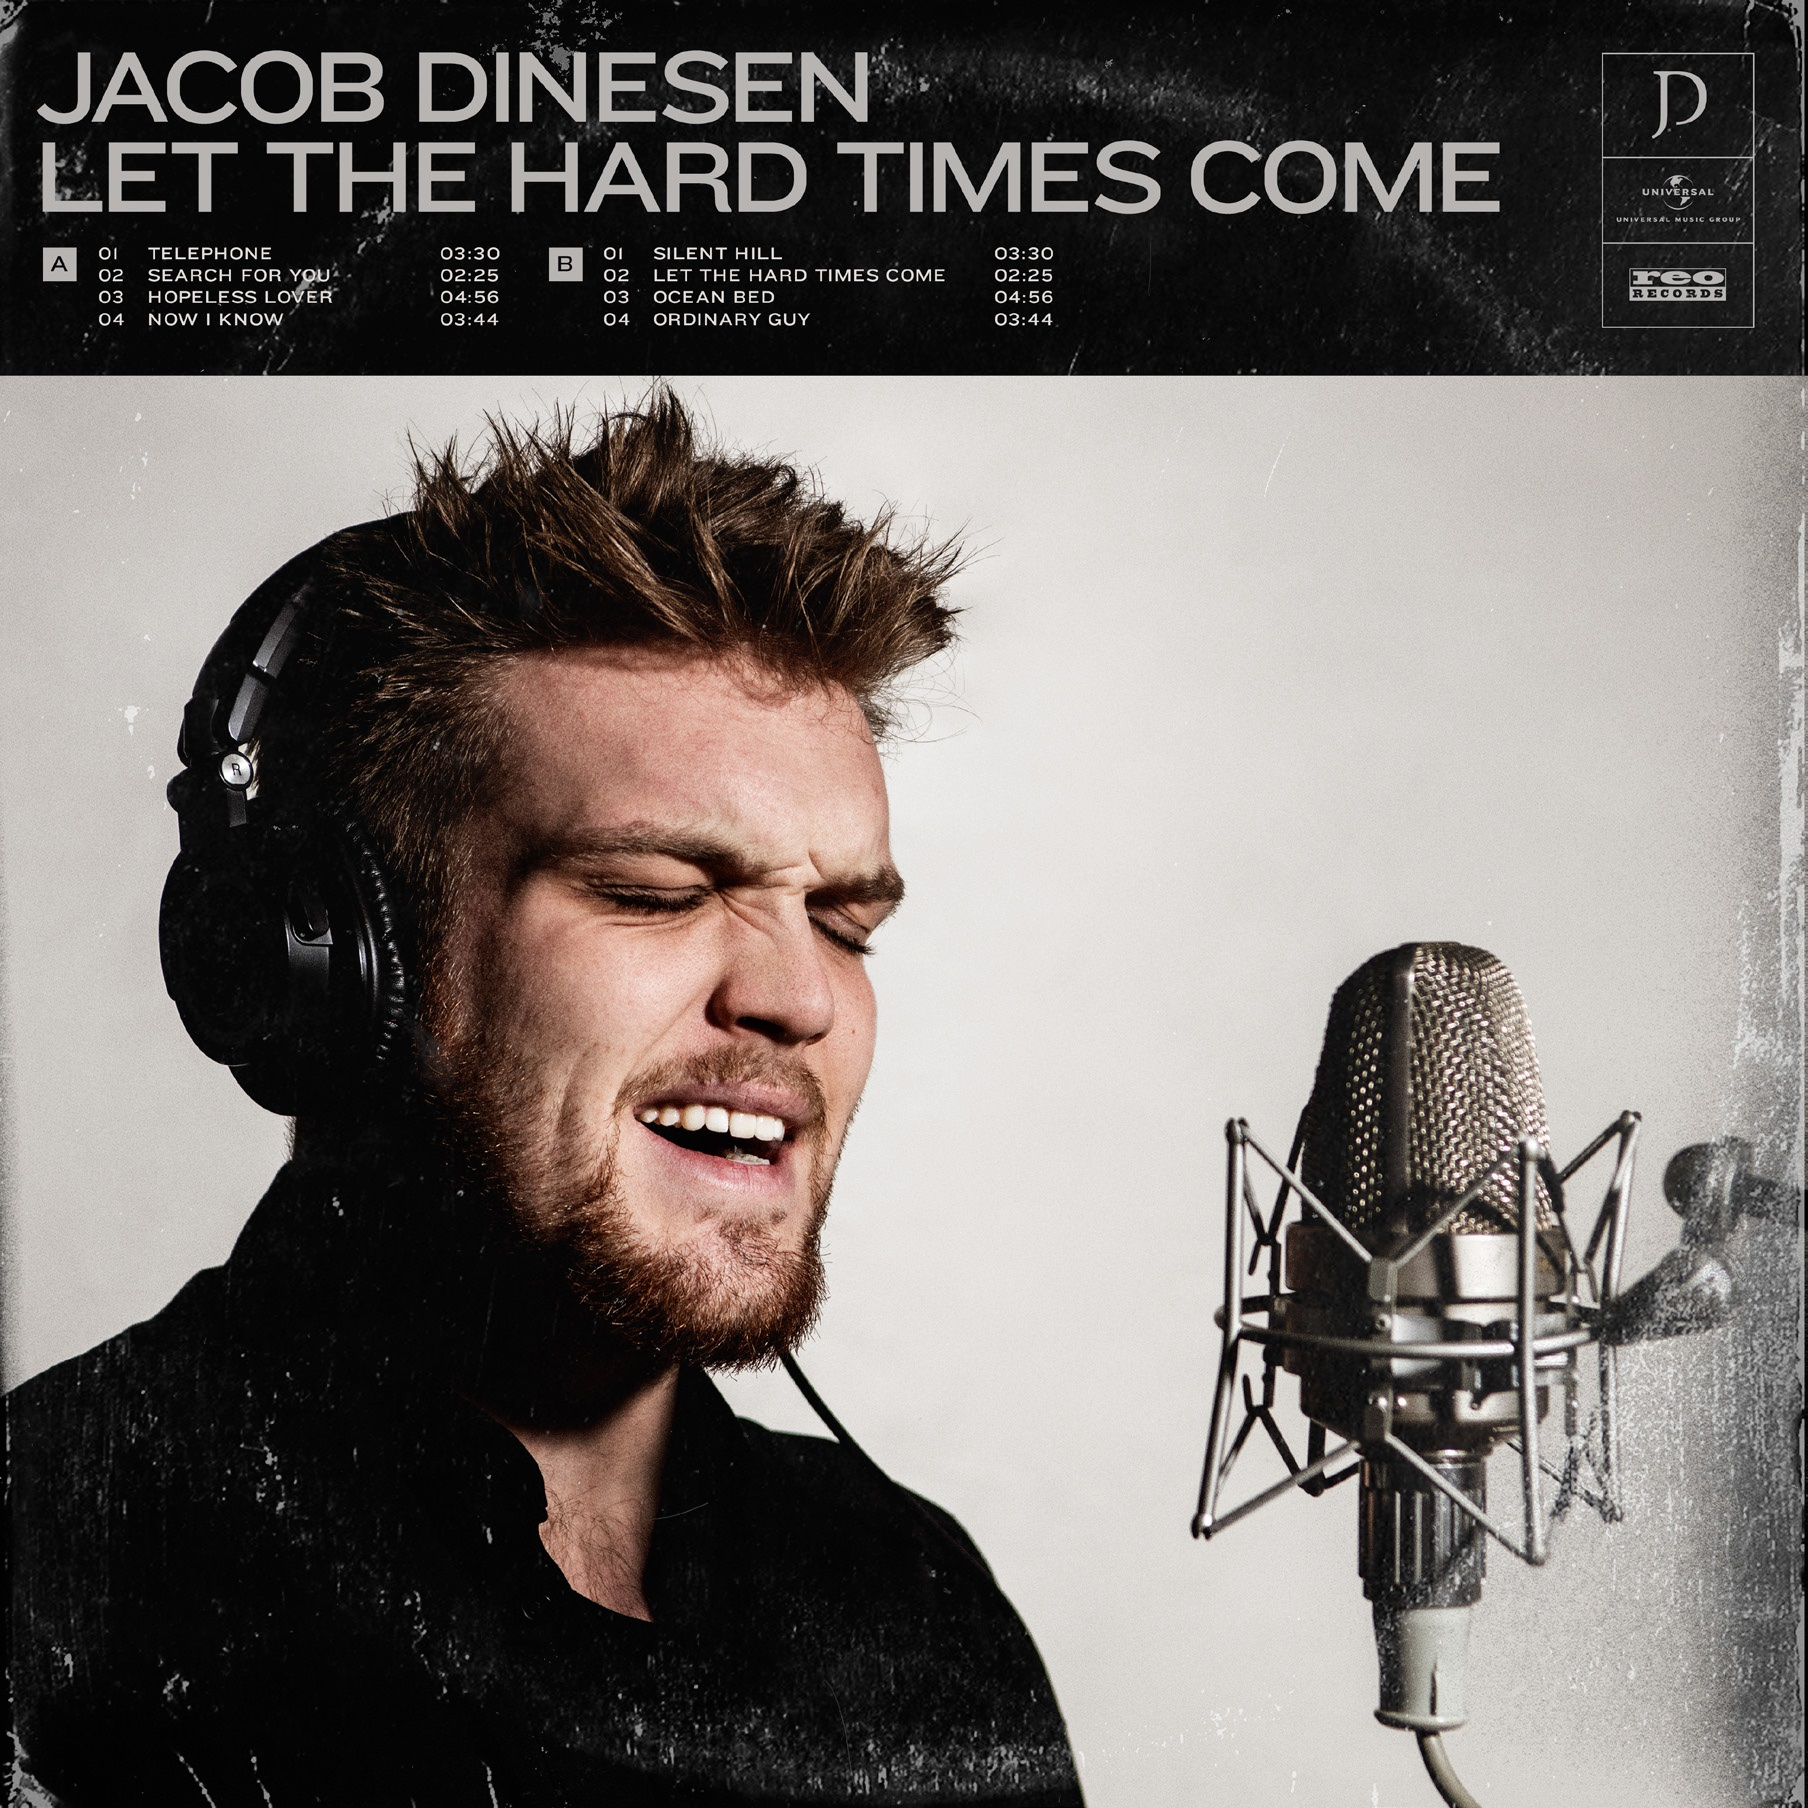 Let The Hard Times Come - Jacob Dinesen - Musik -  - 5056022662455 - 25. september 2020